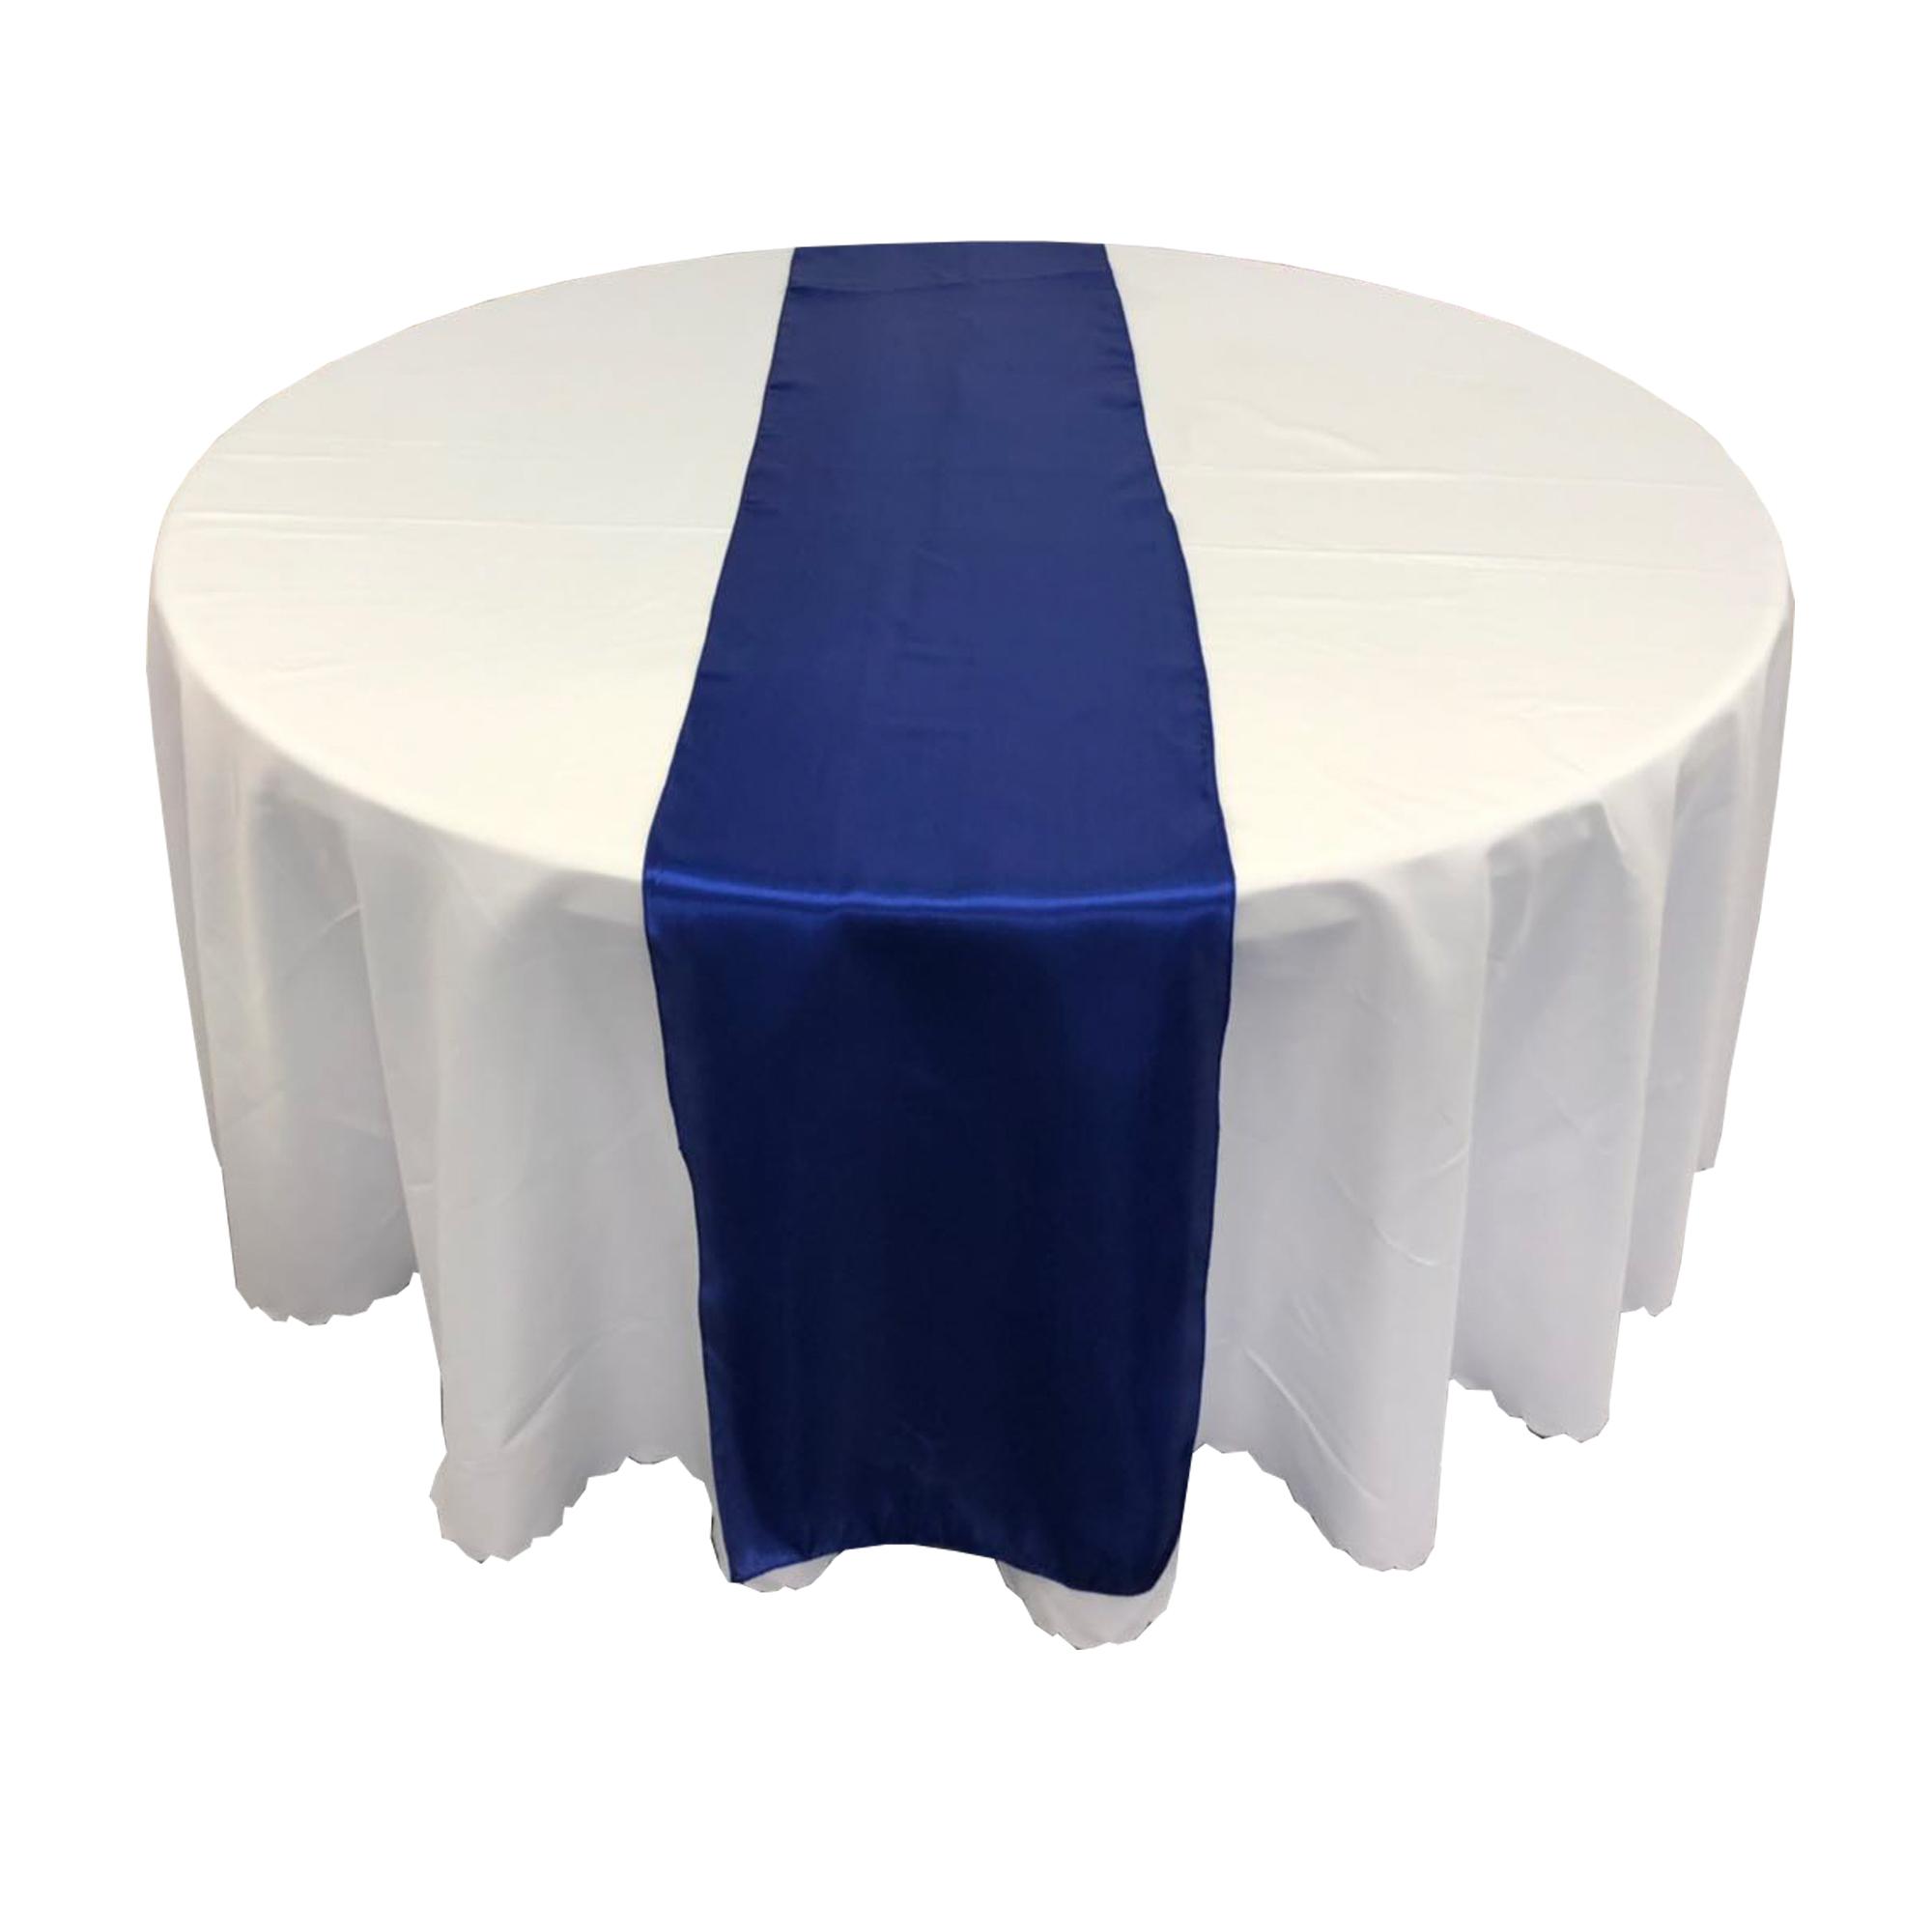 Wedding Table Decorations Navy Blue Satin Polyester Table Runner Buy Wedding Table Runner Satin Table Runners For Weddings Navy Blue Table Runner